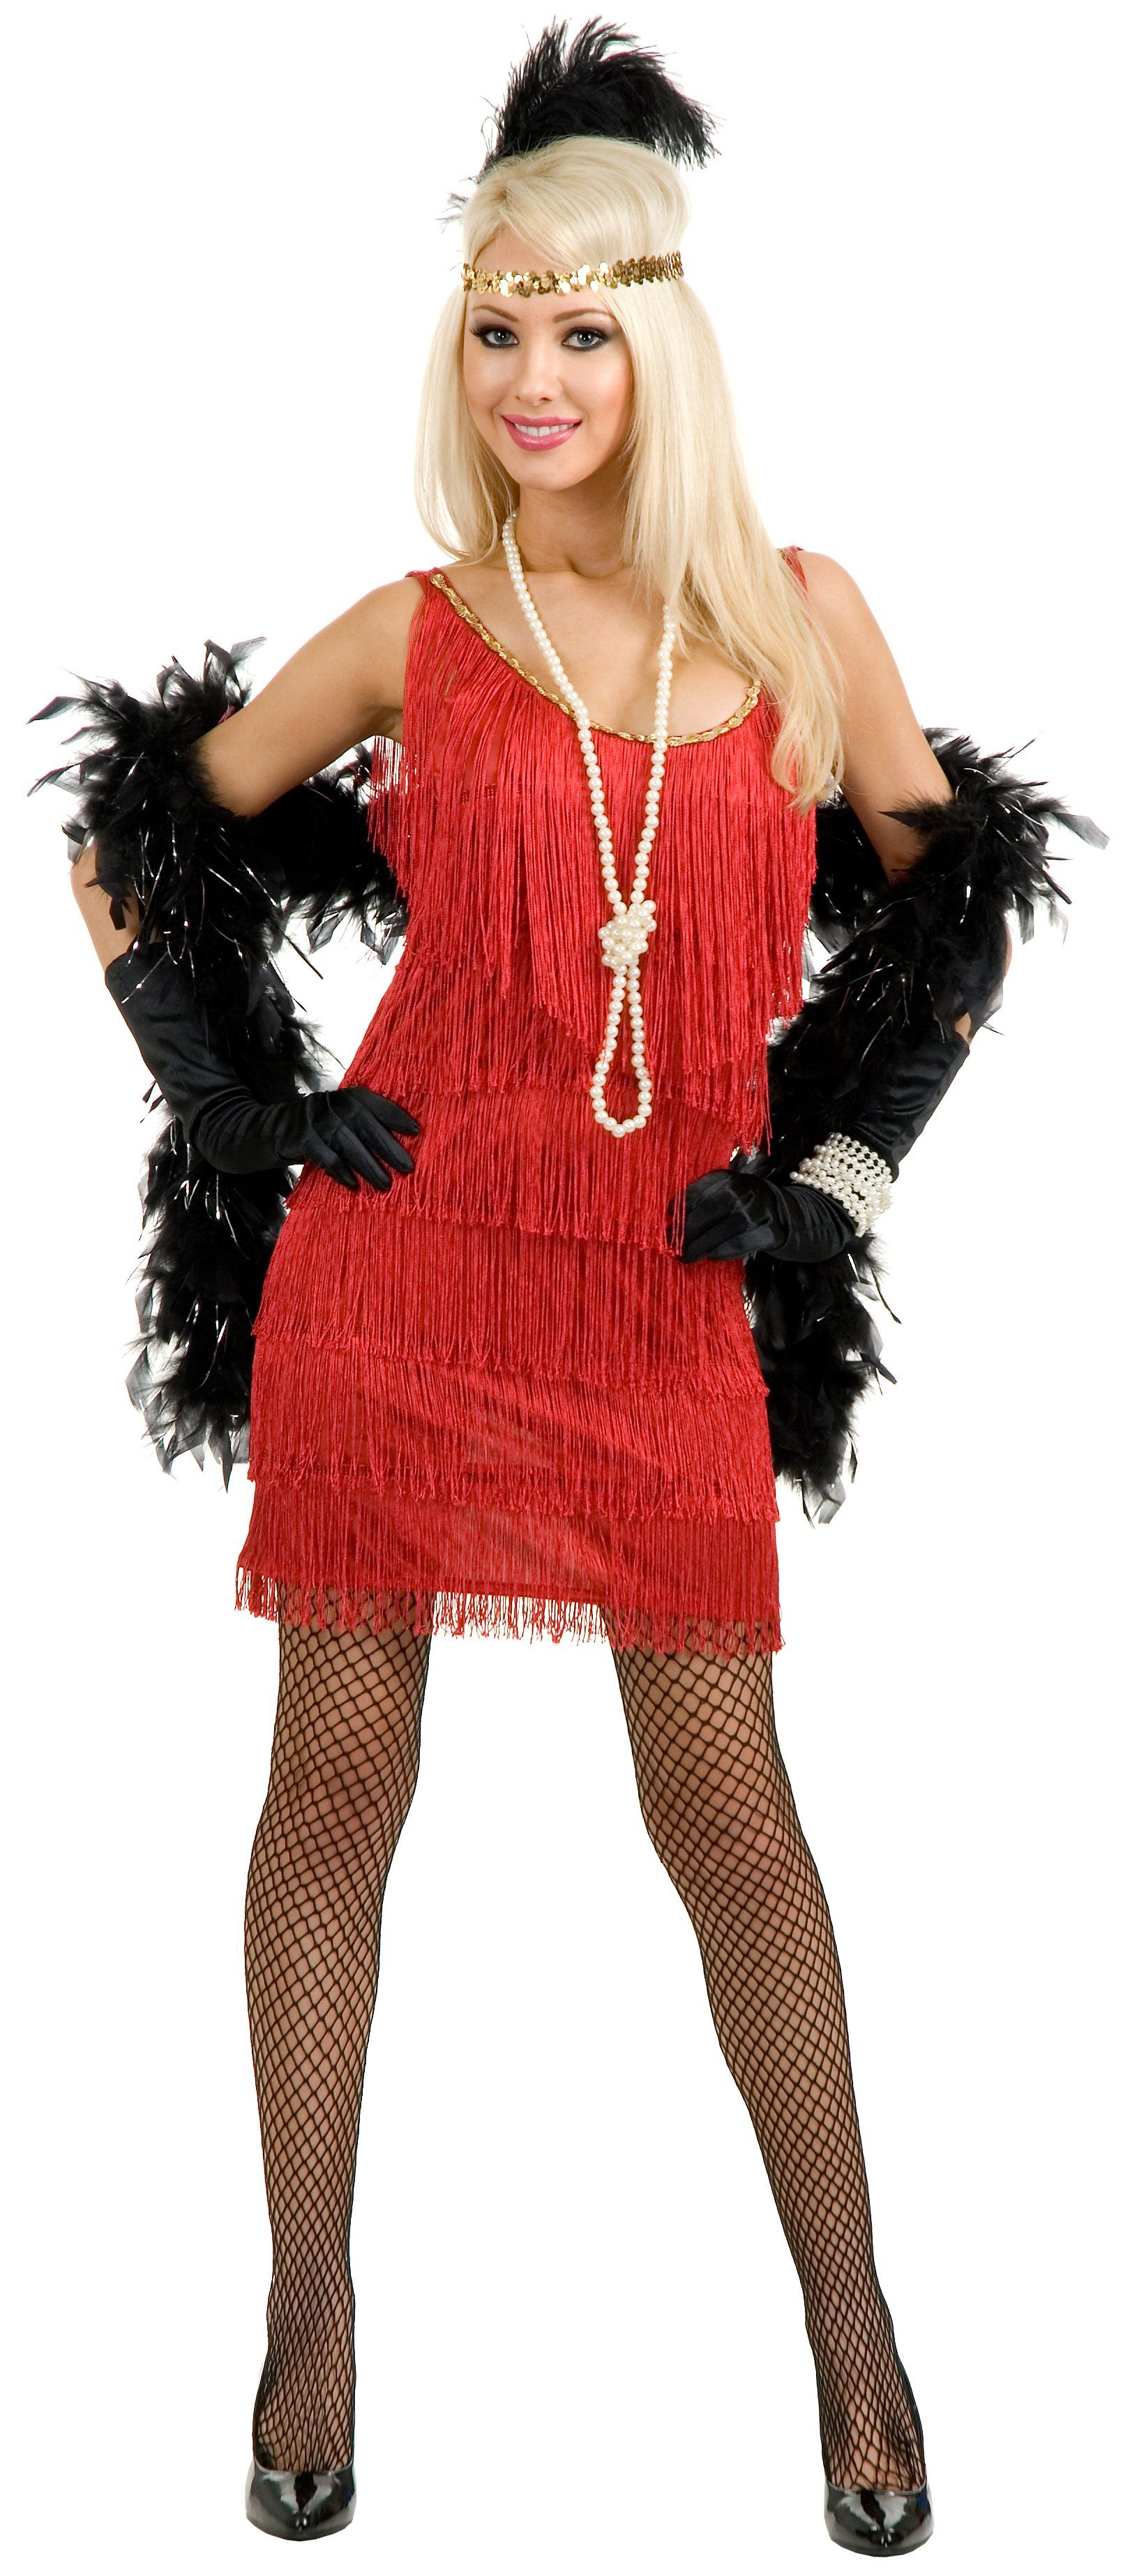 Womens 1920s flapper dress fancy dress costume adult flapper dress - Fashion Flapper Red Adult Plus Costume Flapper Girl Costumesflapper